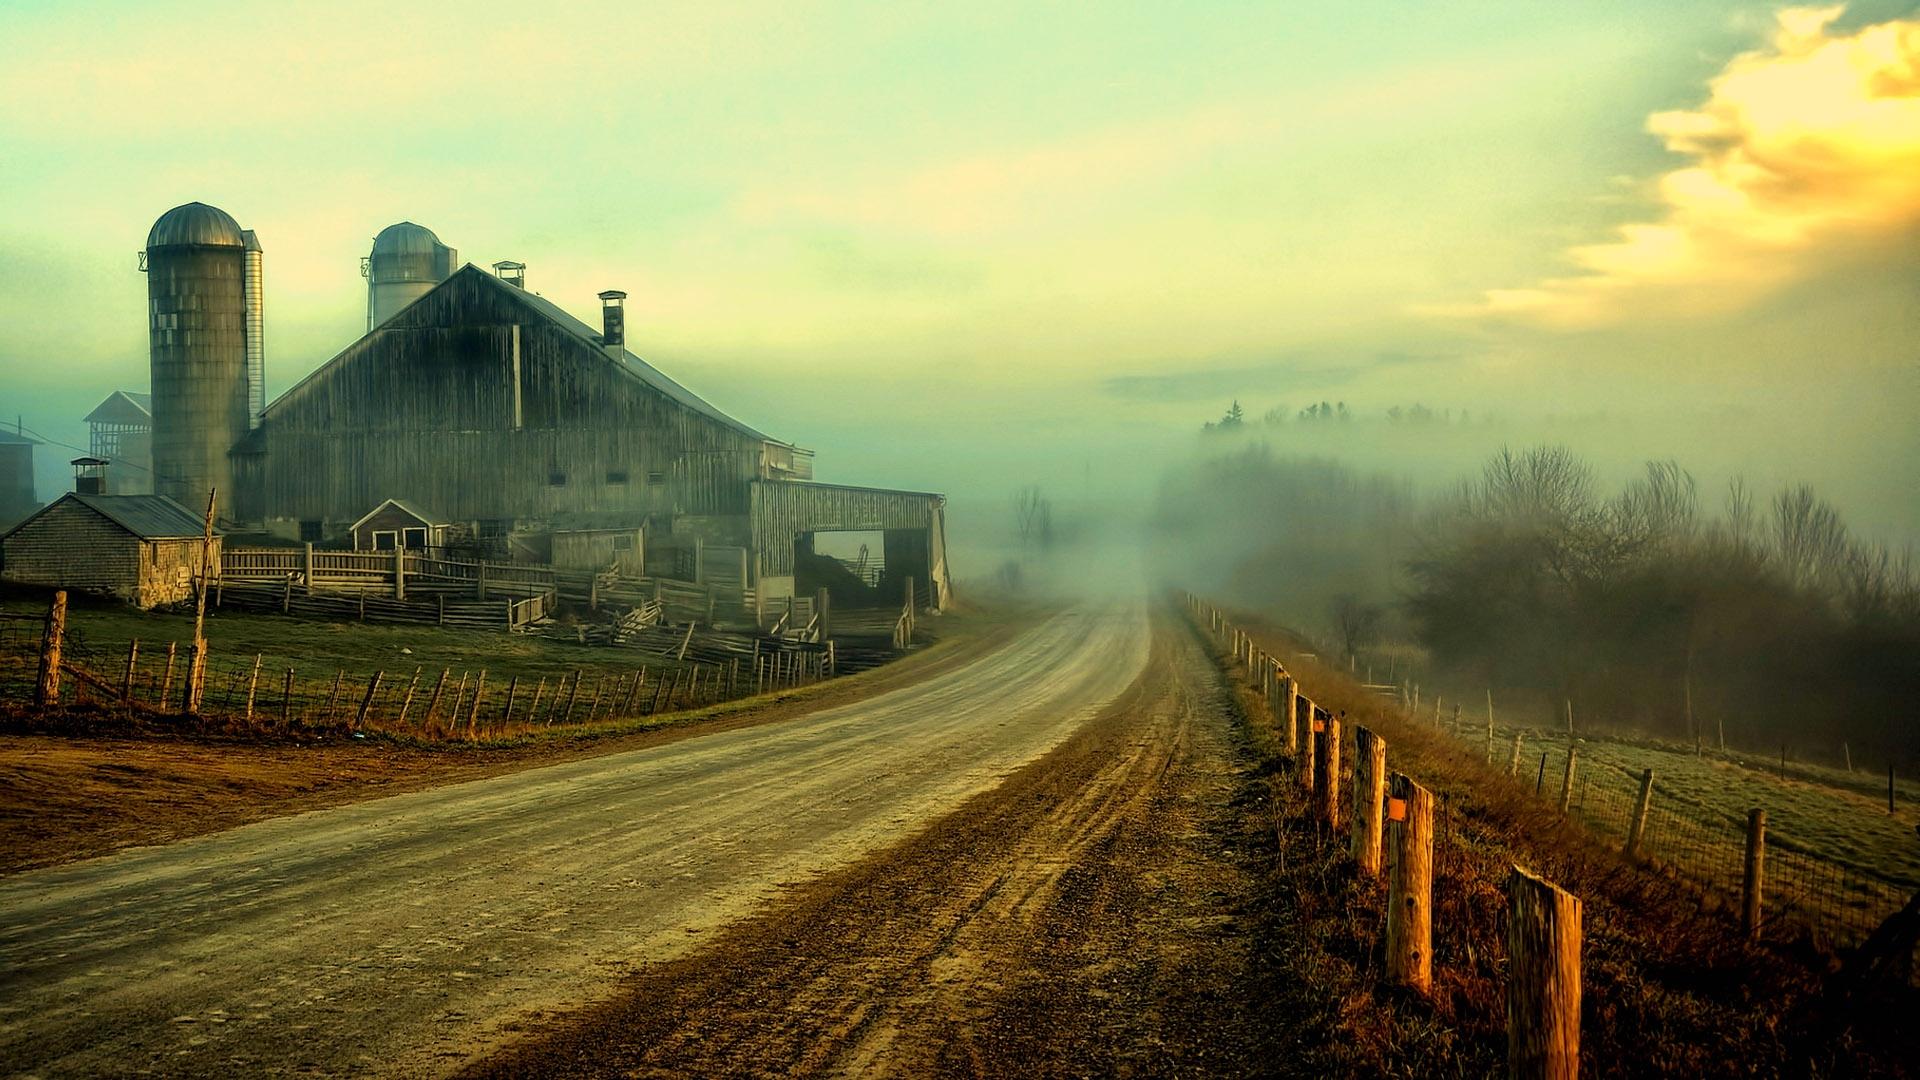 Nature landscapes farm rustic roads fence sky clouds 1920x1080